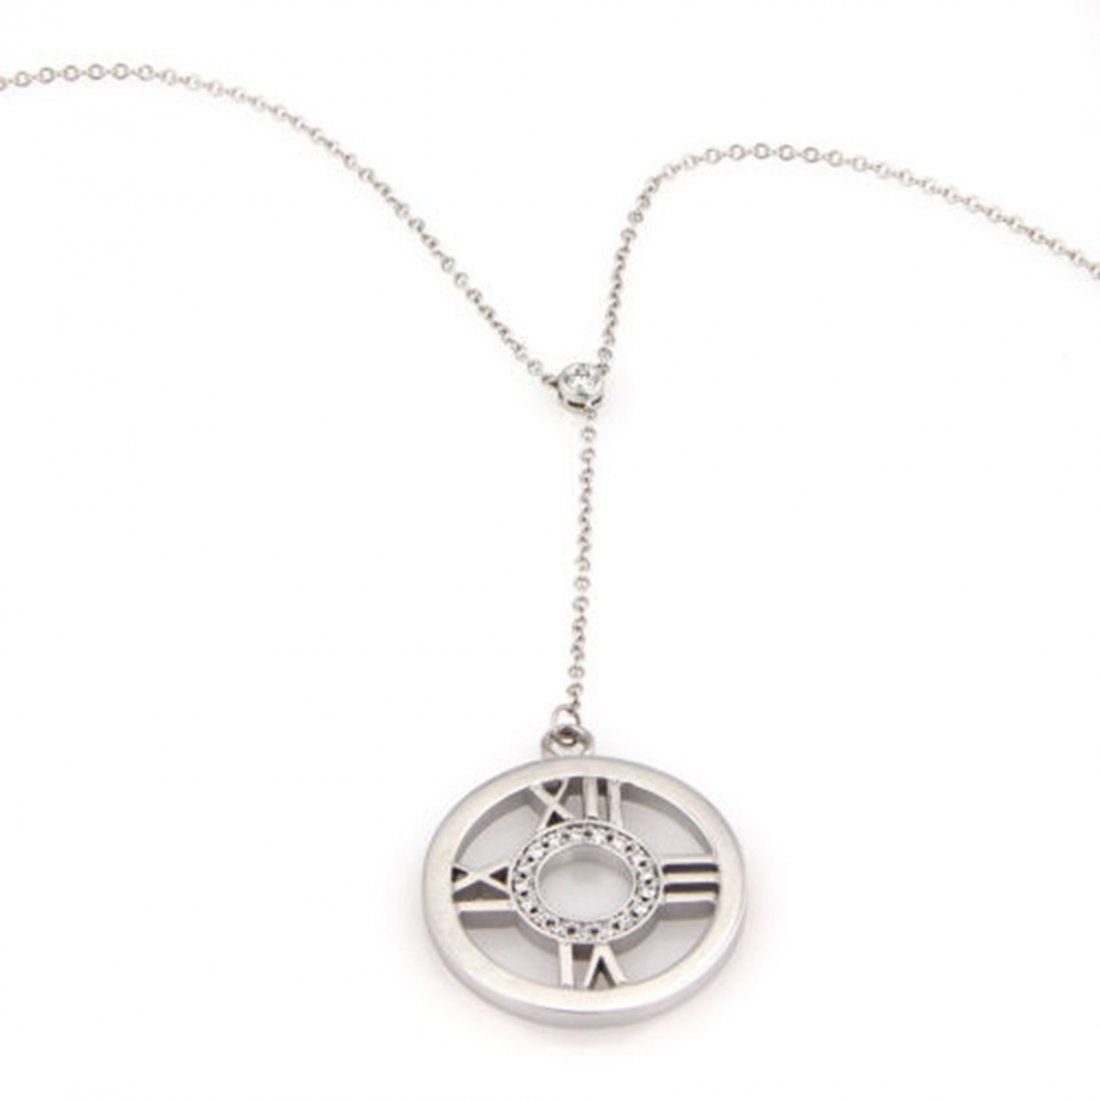 Tiffany & Co. 18K White Gold Diamond Circle ATLAS